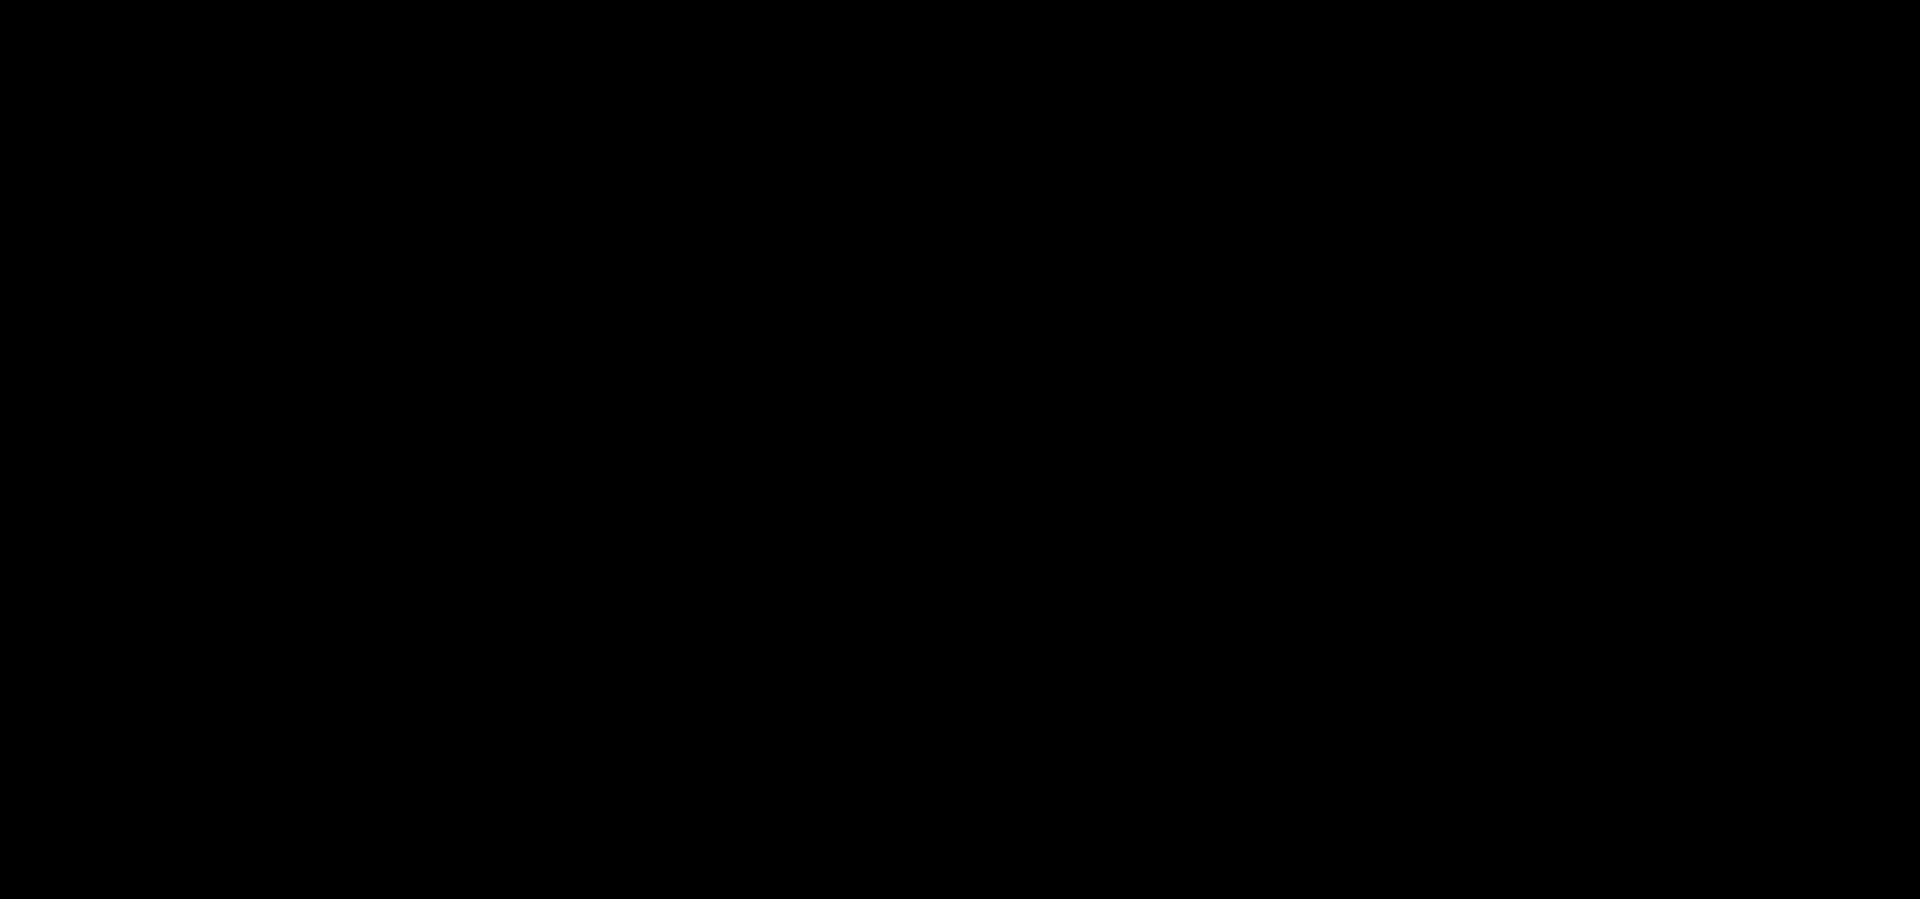 Sinya